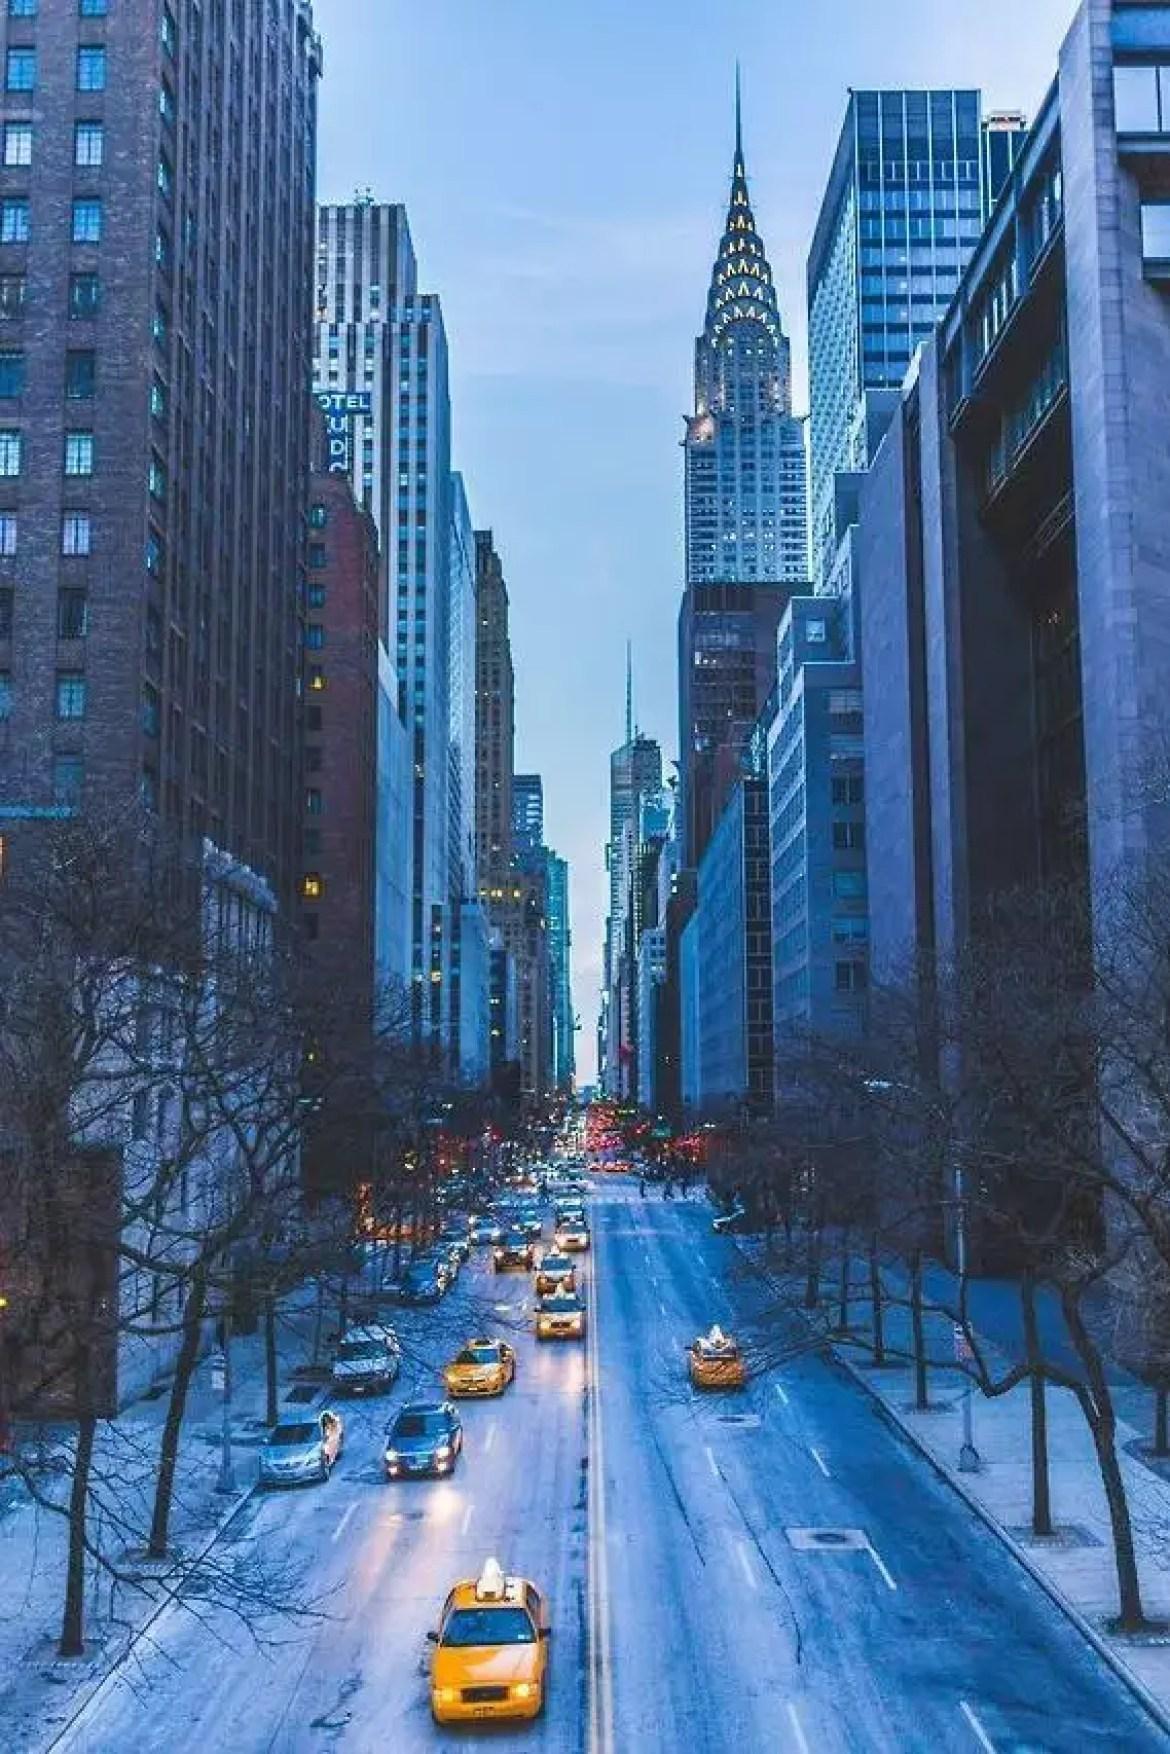 internship in a new city